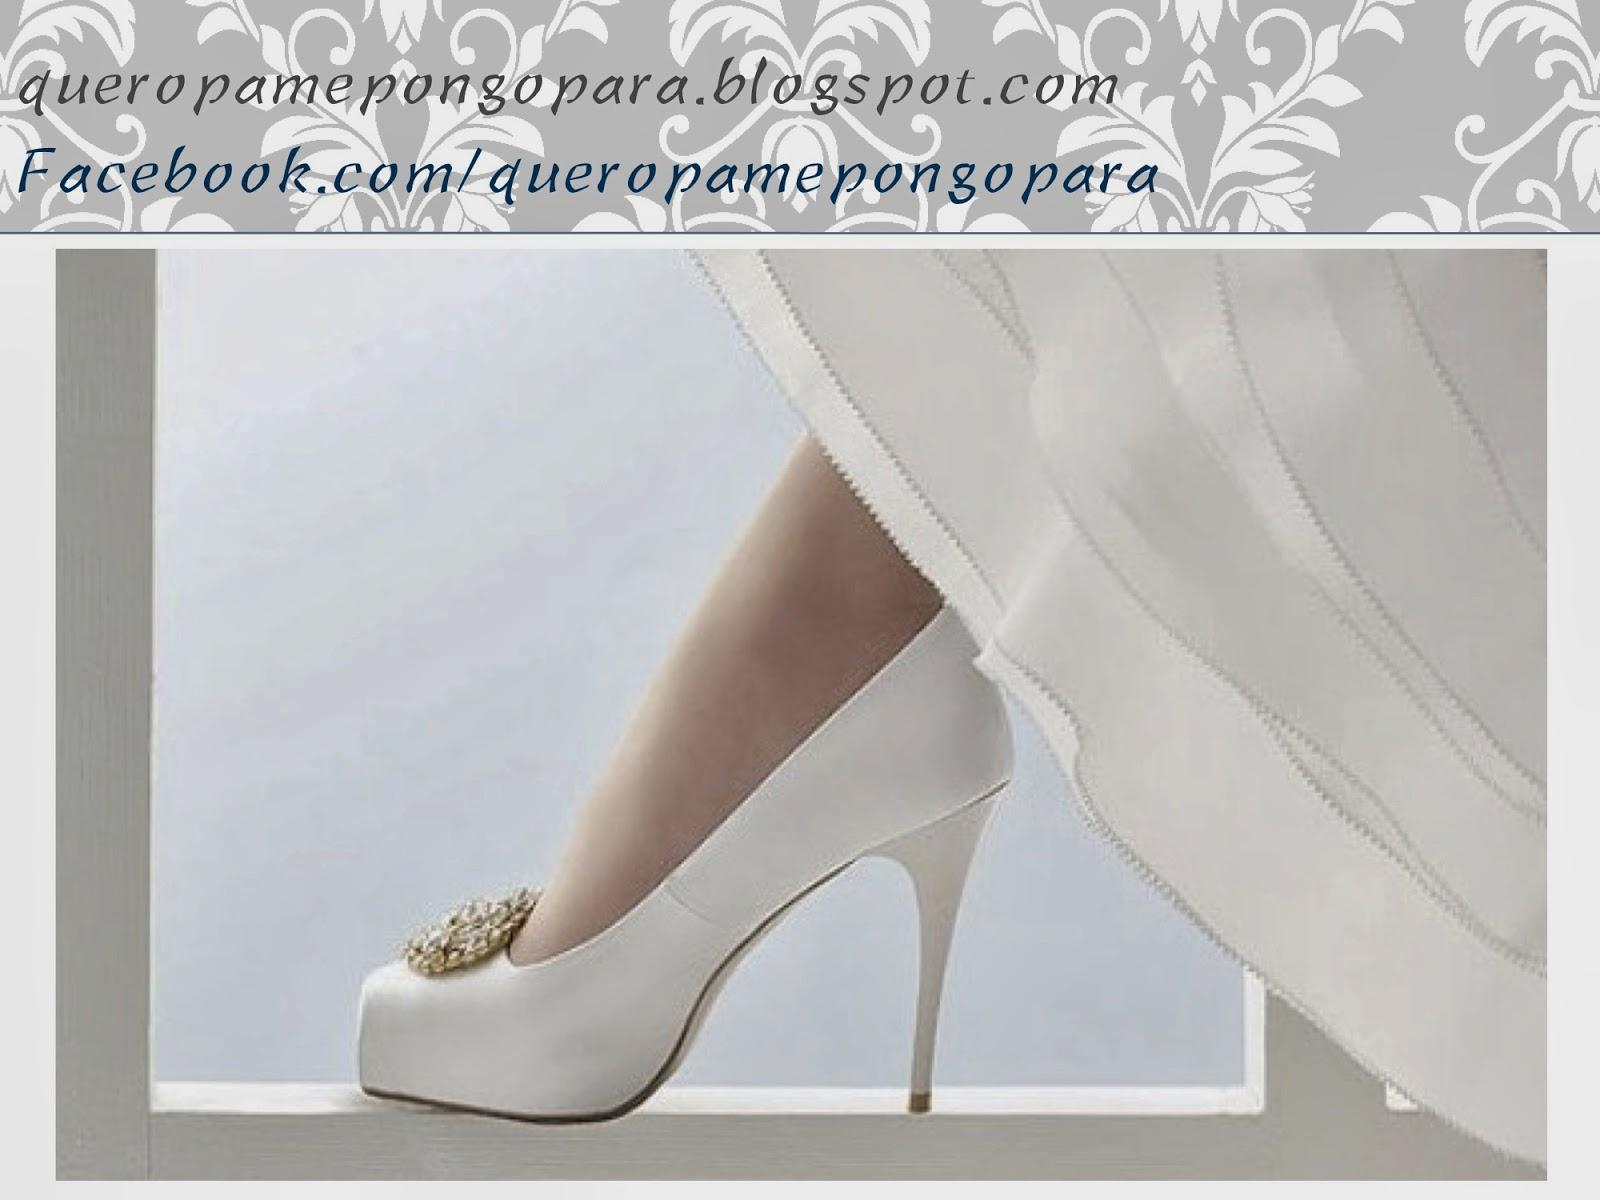 QUE ZAPATOS ME PONGO CON UN VESTIDO DE NOVIA - Calzado para novias - Outfits matrimoniales